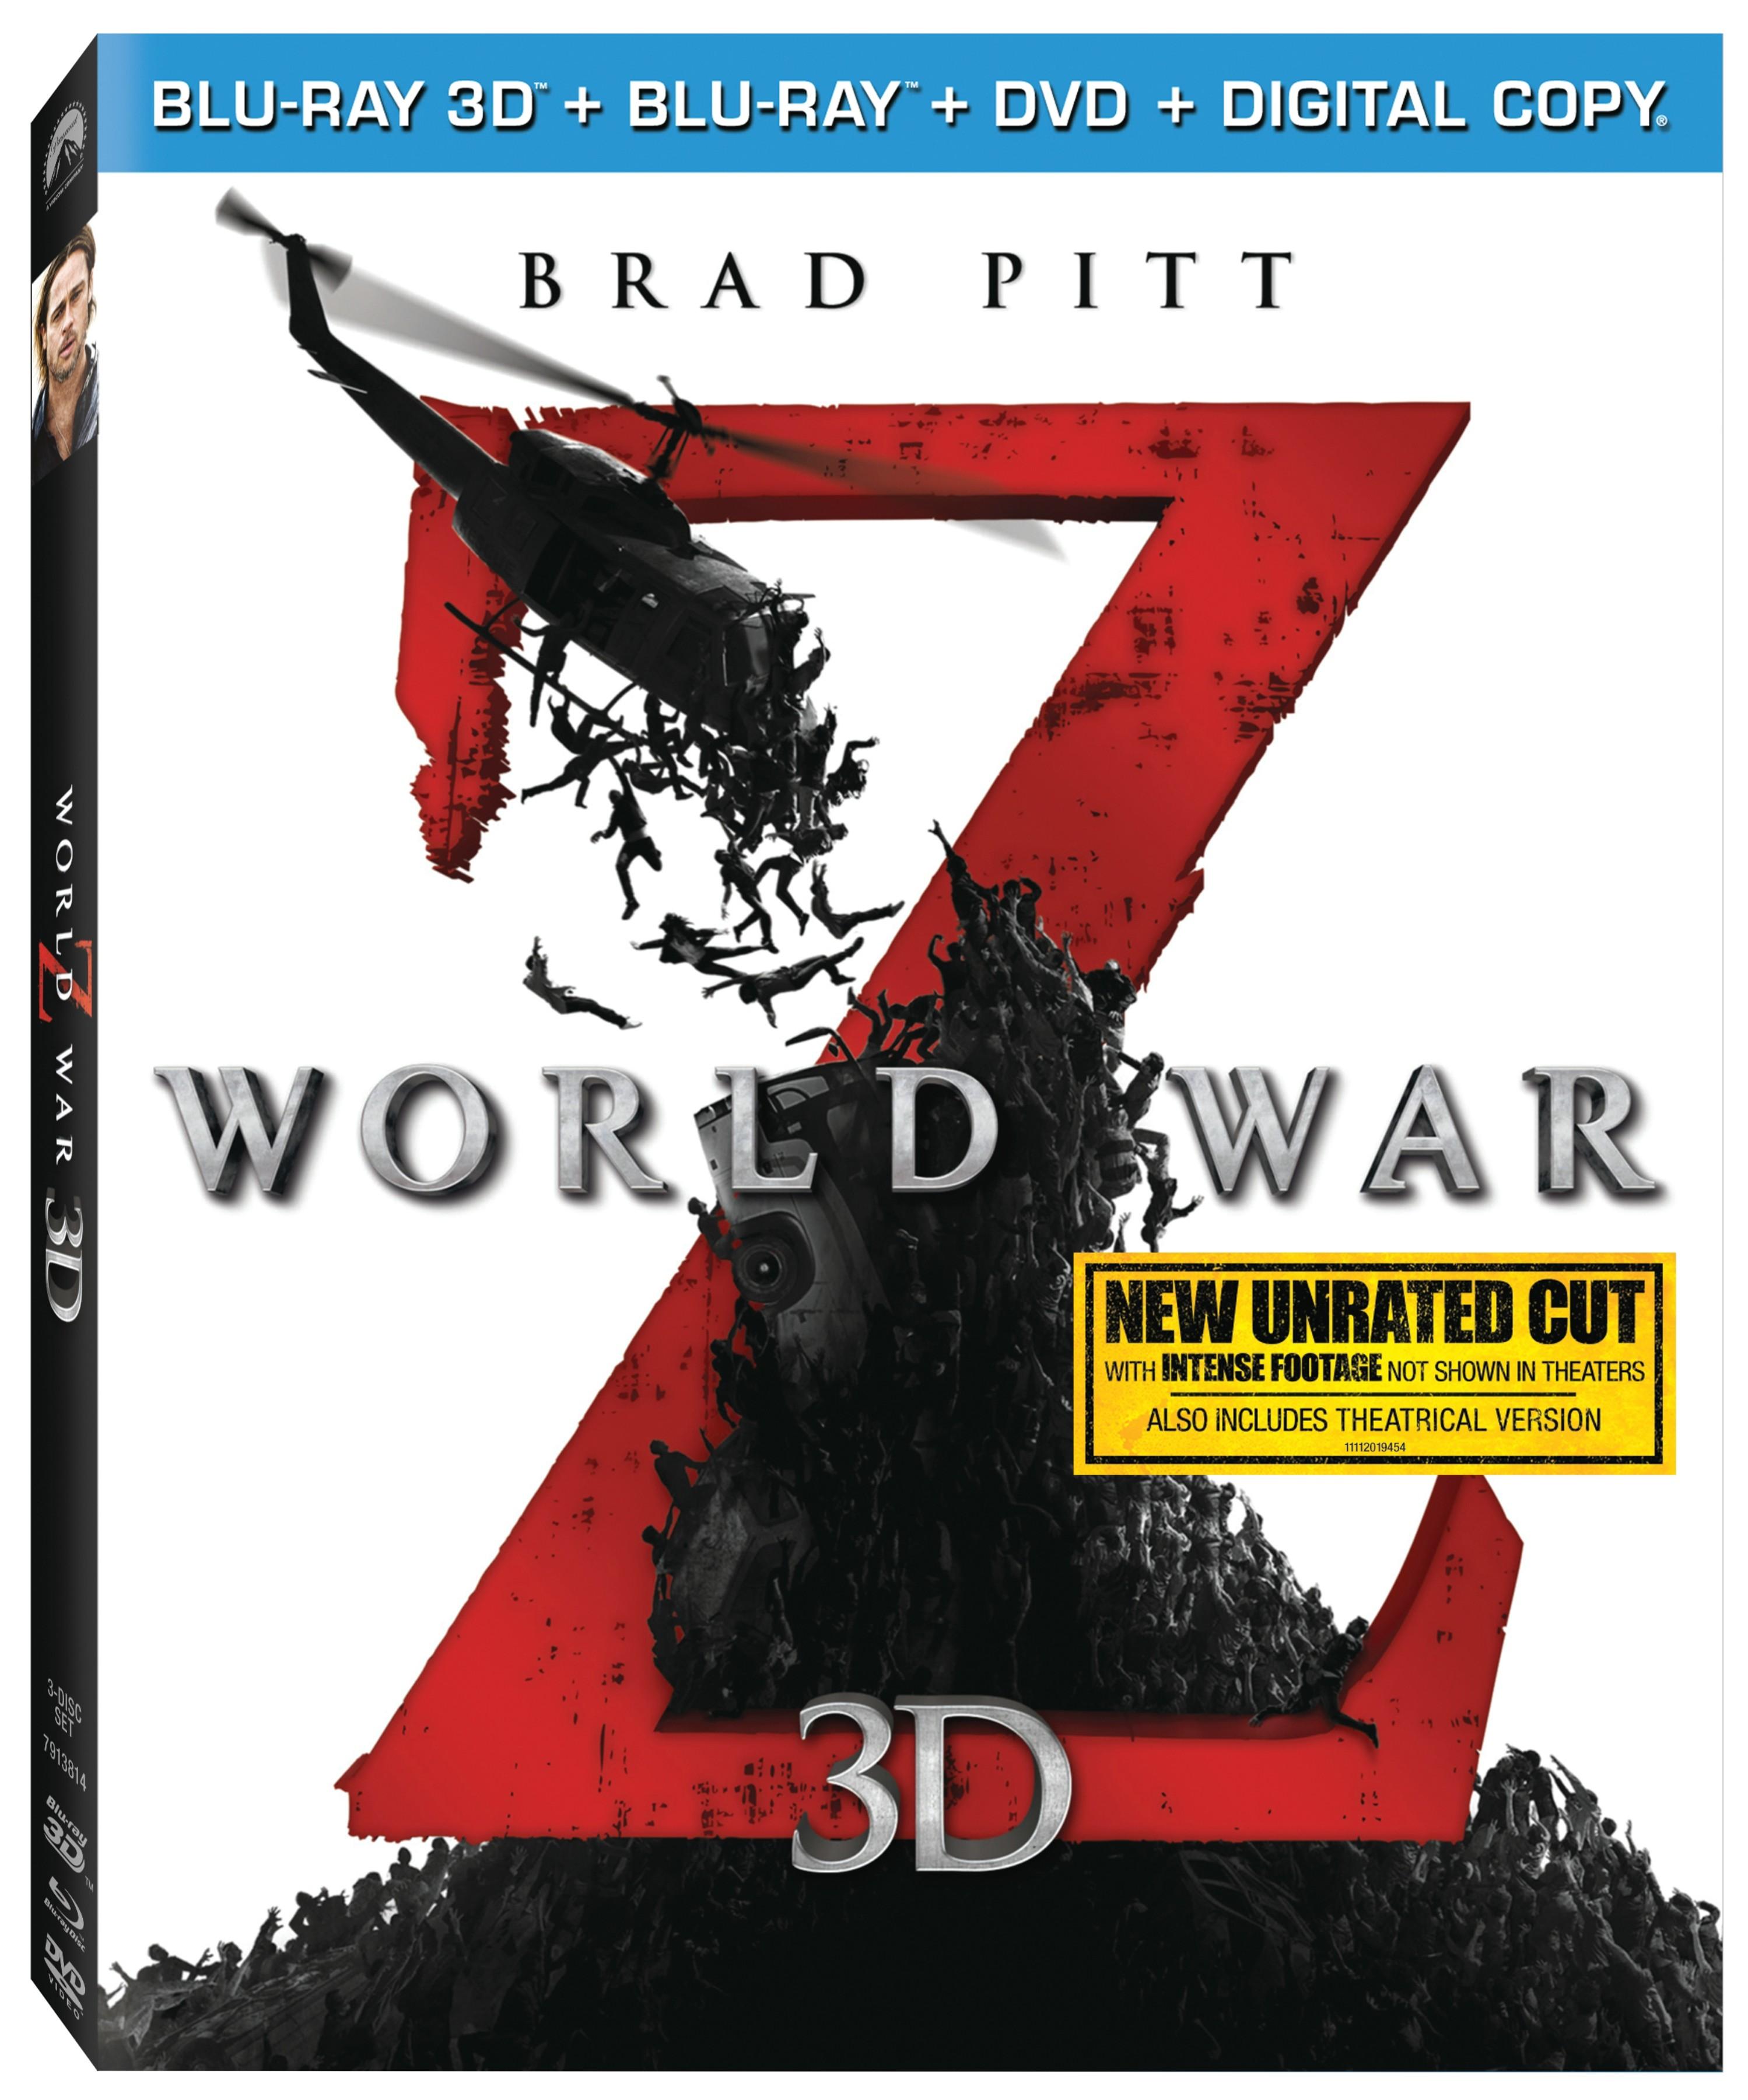 WorldWarZ_3DCombo_BRD_3D